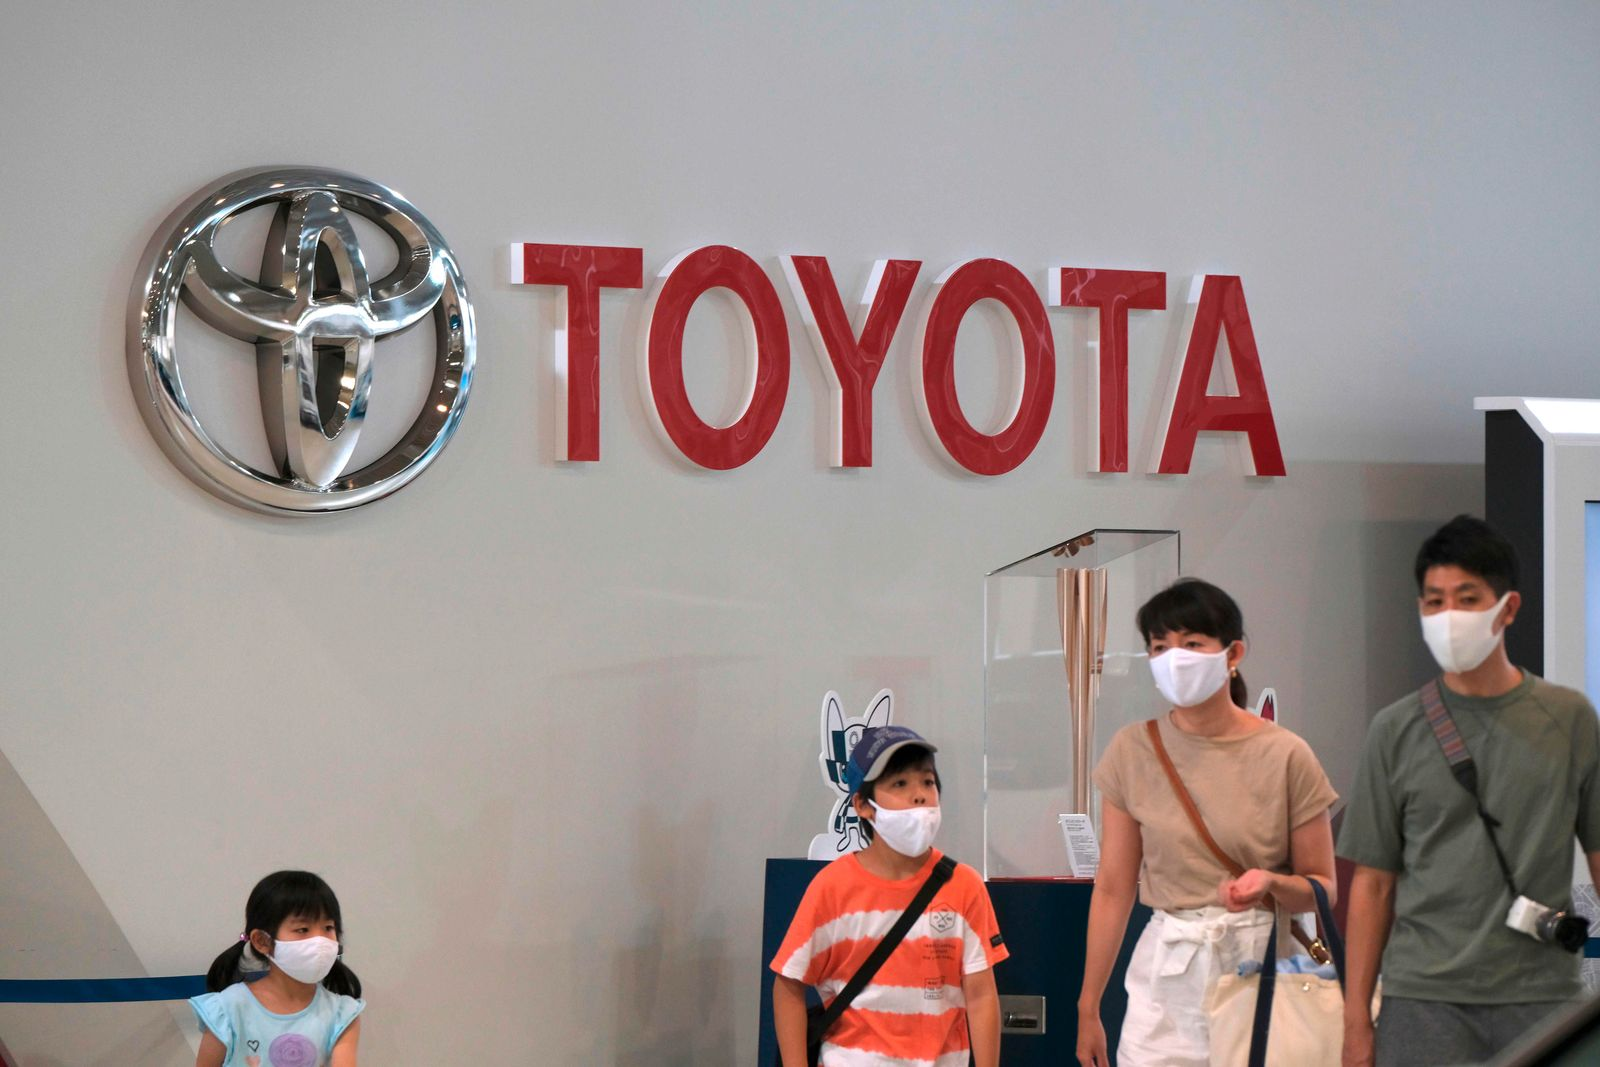 JAPAN-AUTOMOBILE-TOYOTA-EARNINGS